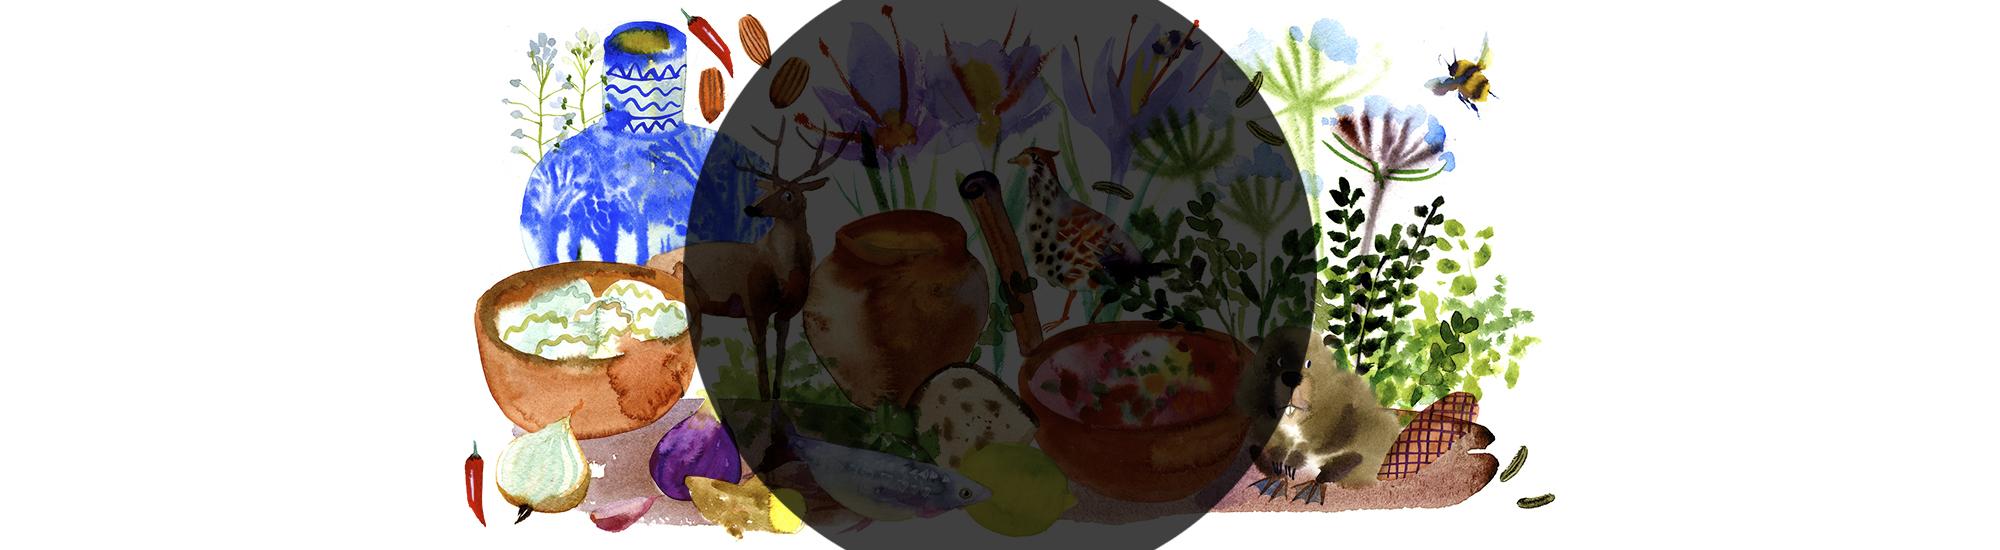 Інший смак: Старопольська кухня на смак та колір